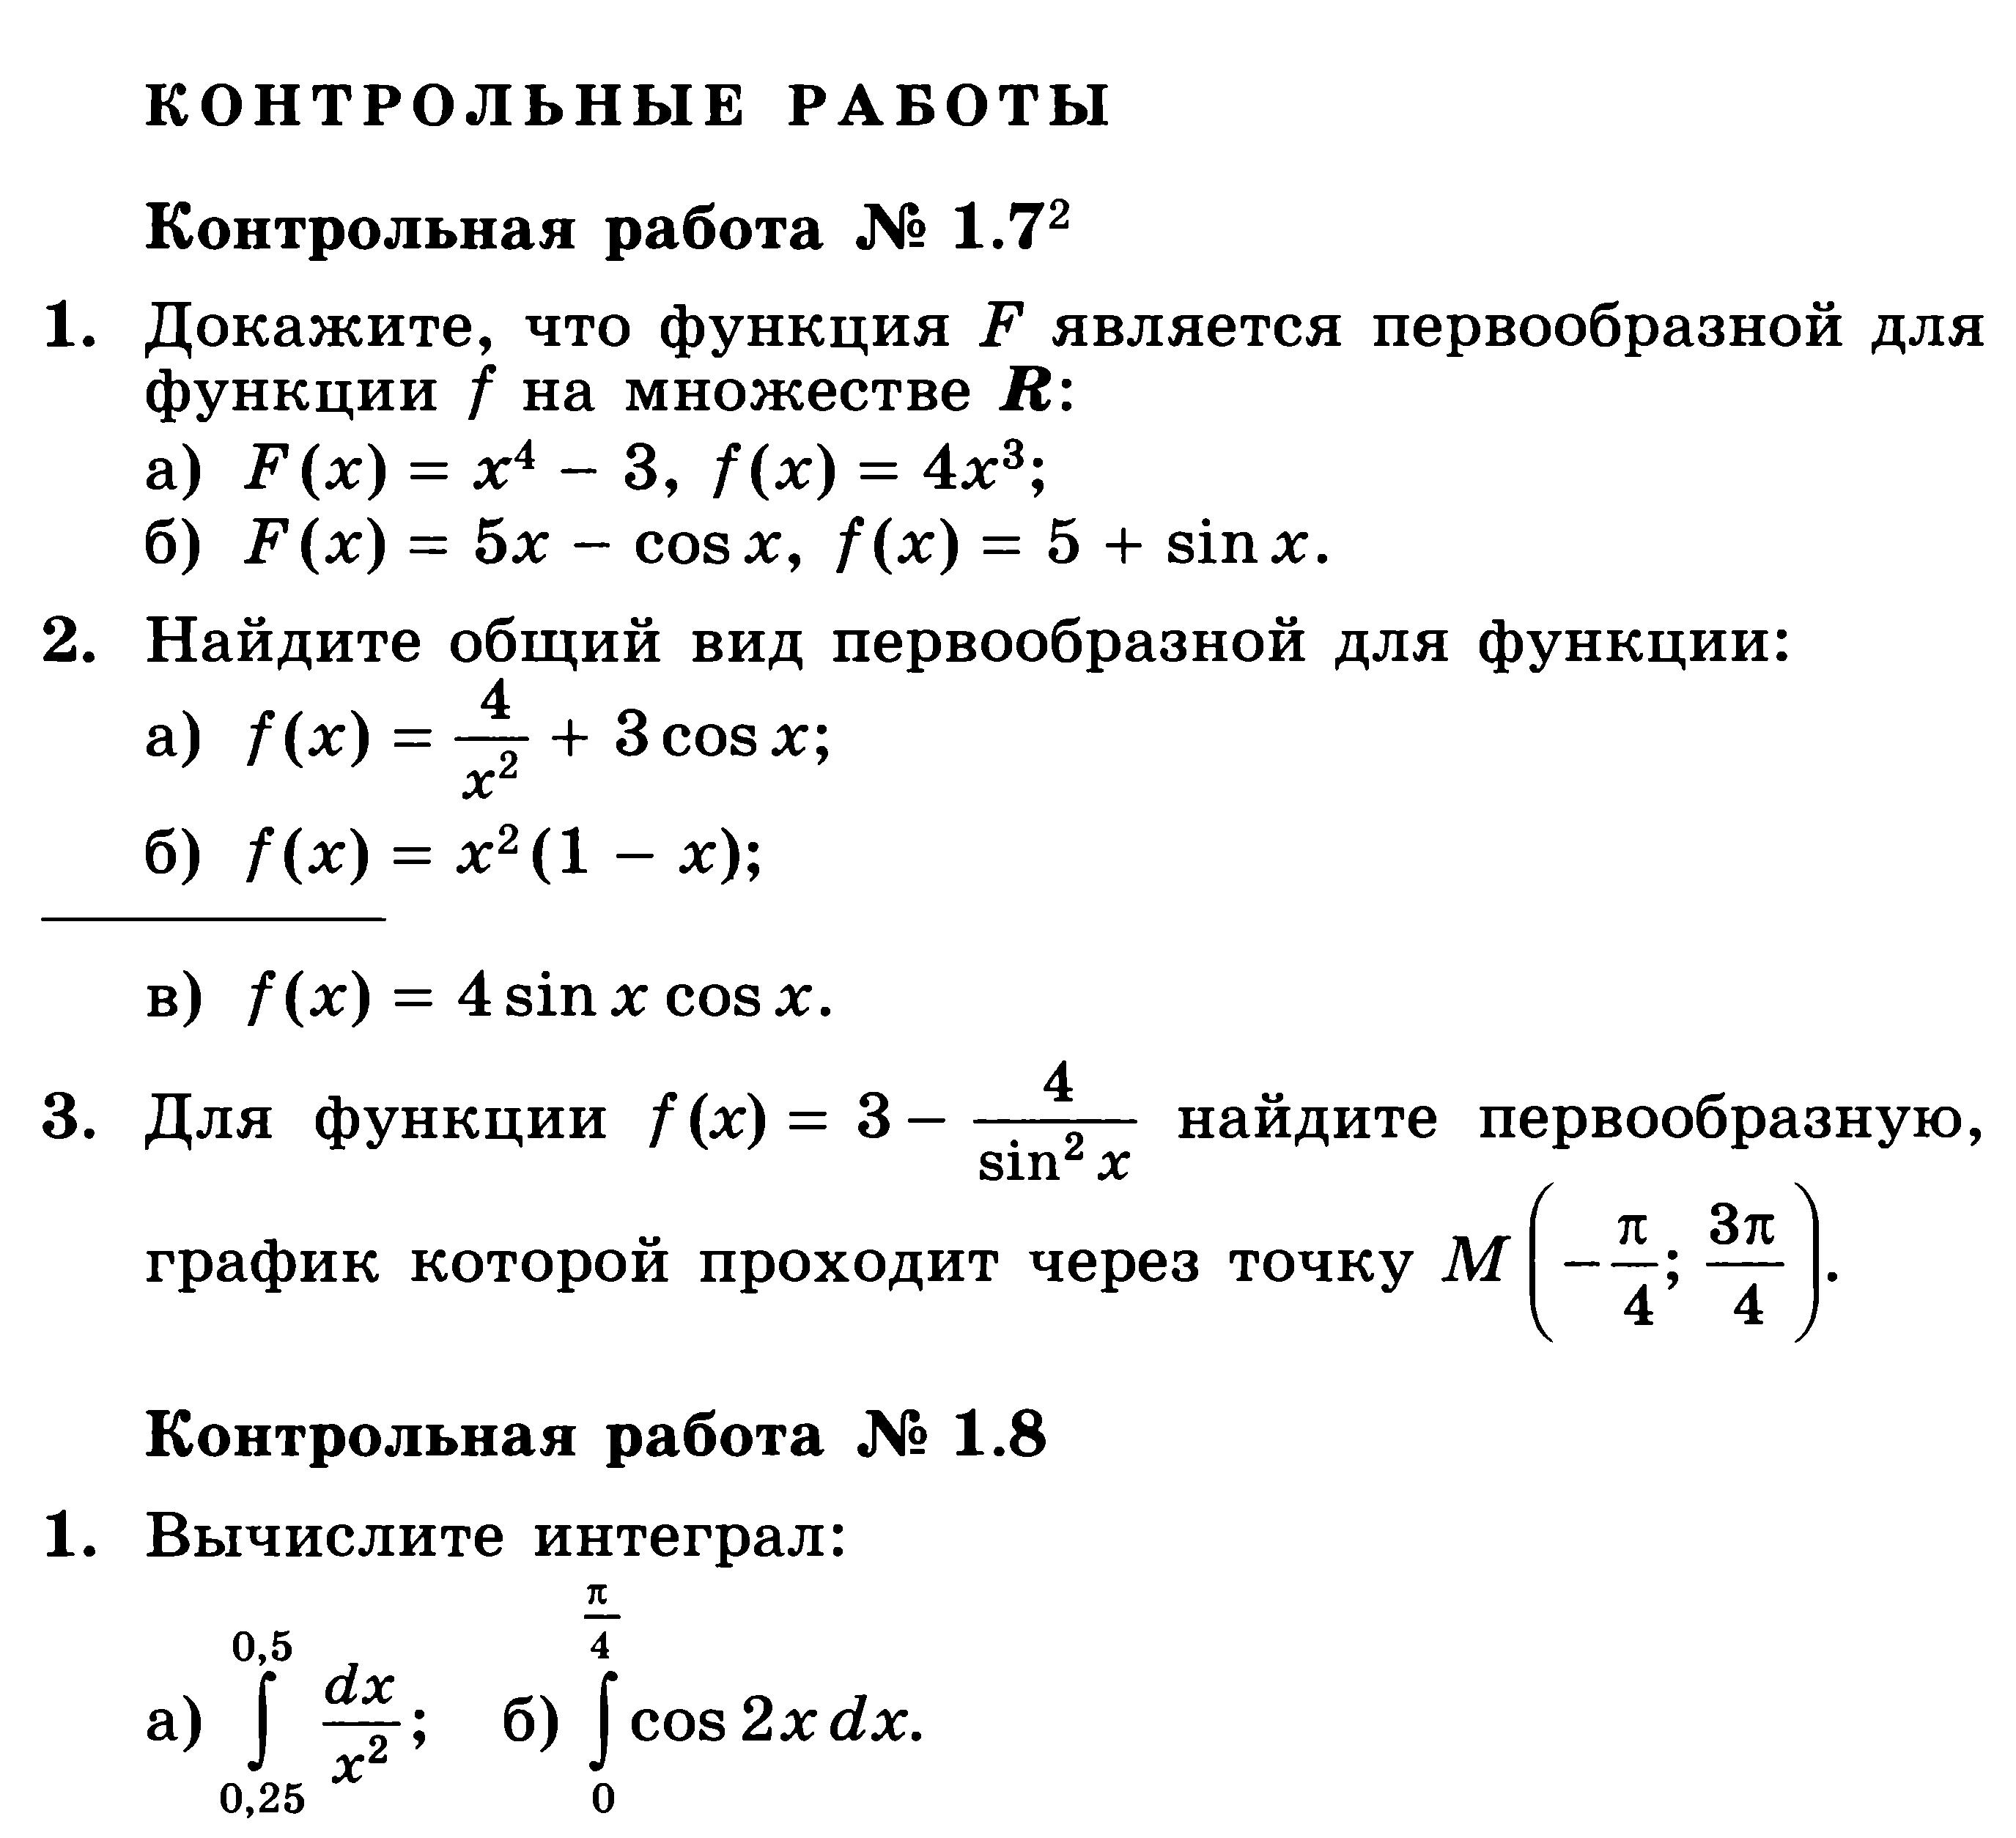 Рабочая программа по математике класс hello html m3f174b34 png